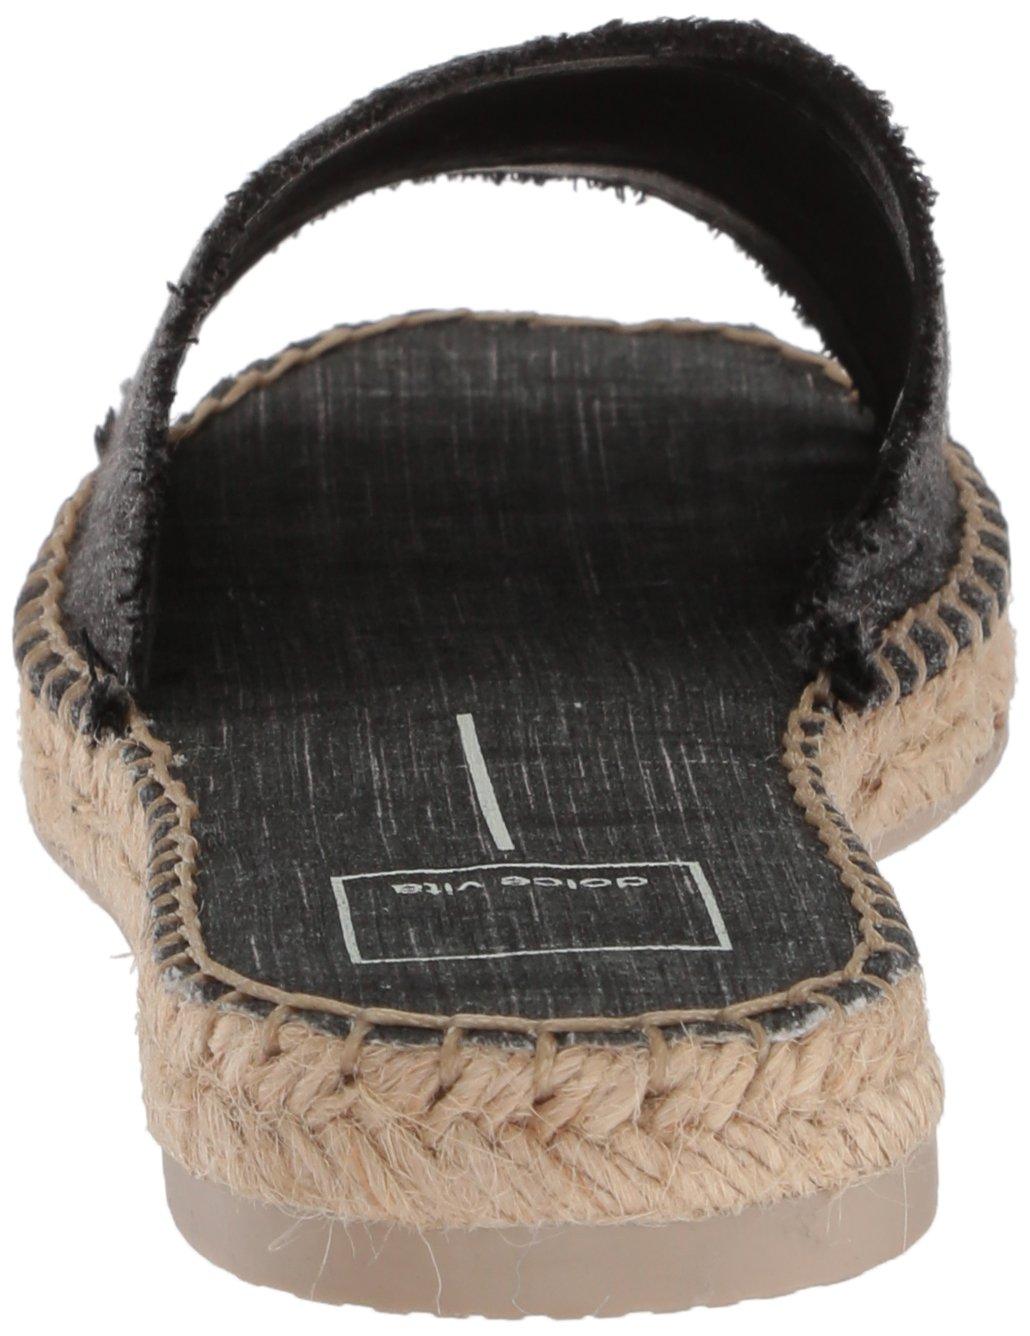 Dolce Vita Women's Bobbi Slide Sandal B077QT1GHX 7 B(M) US|Ash Denim